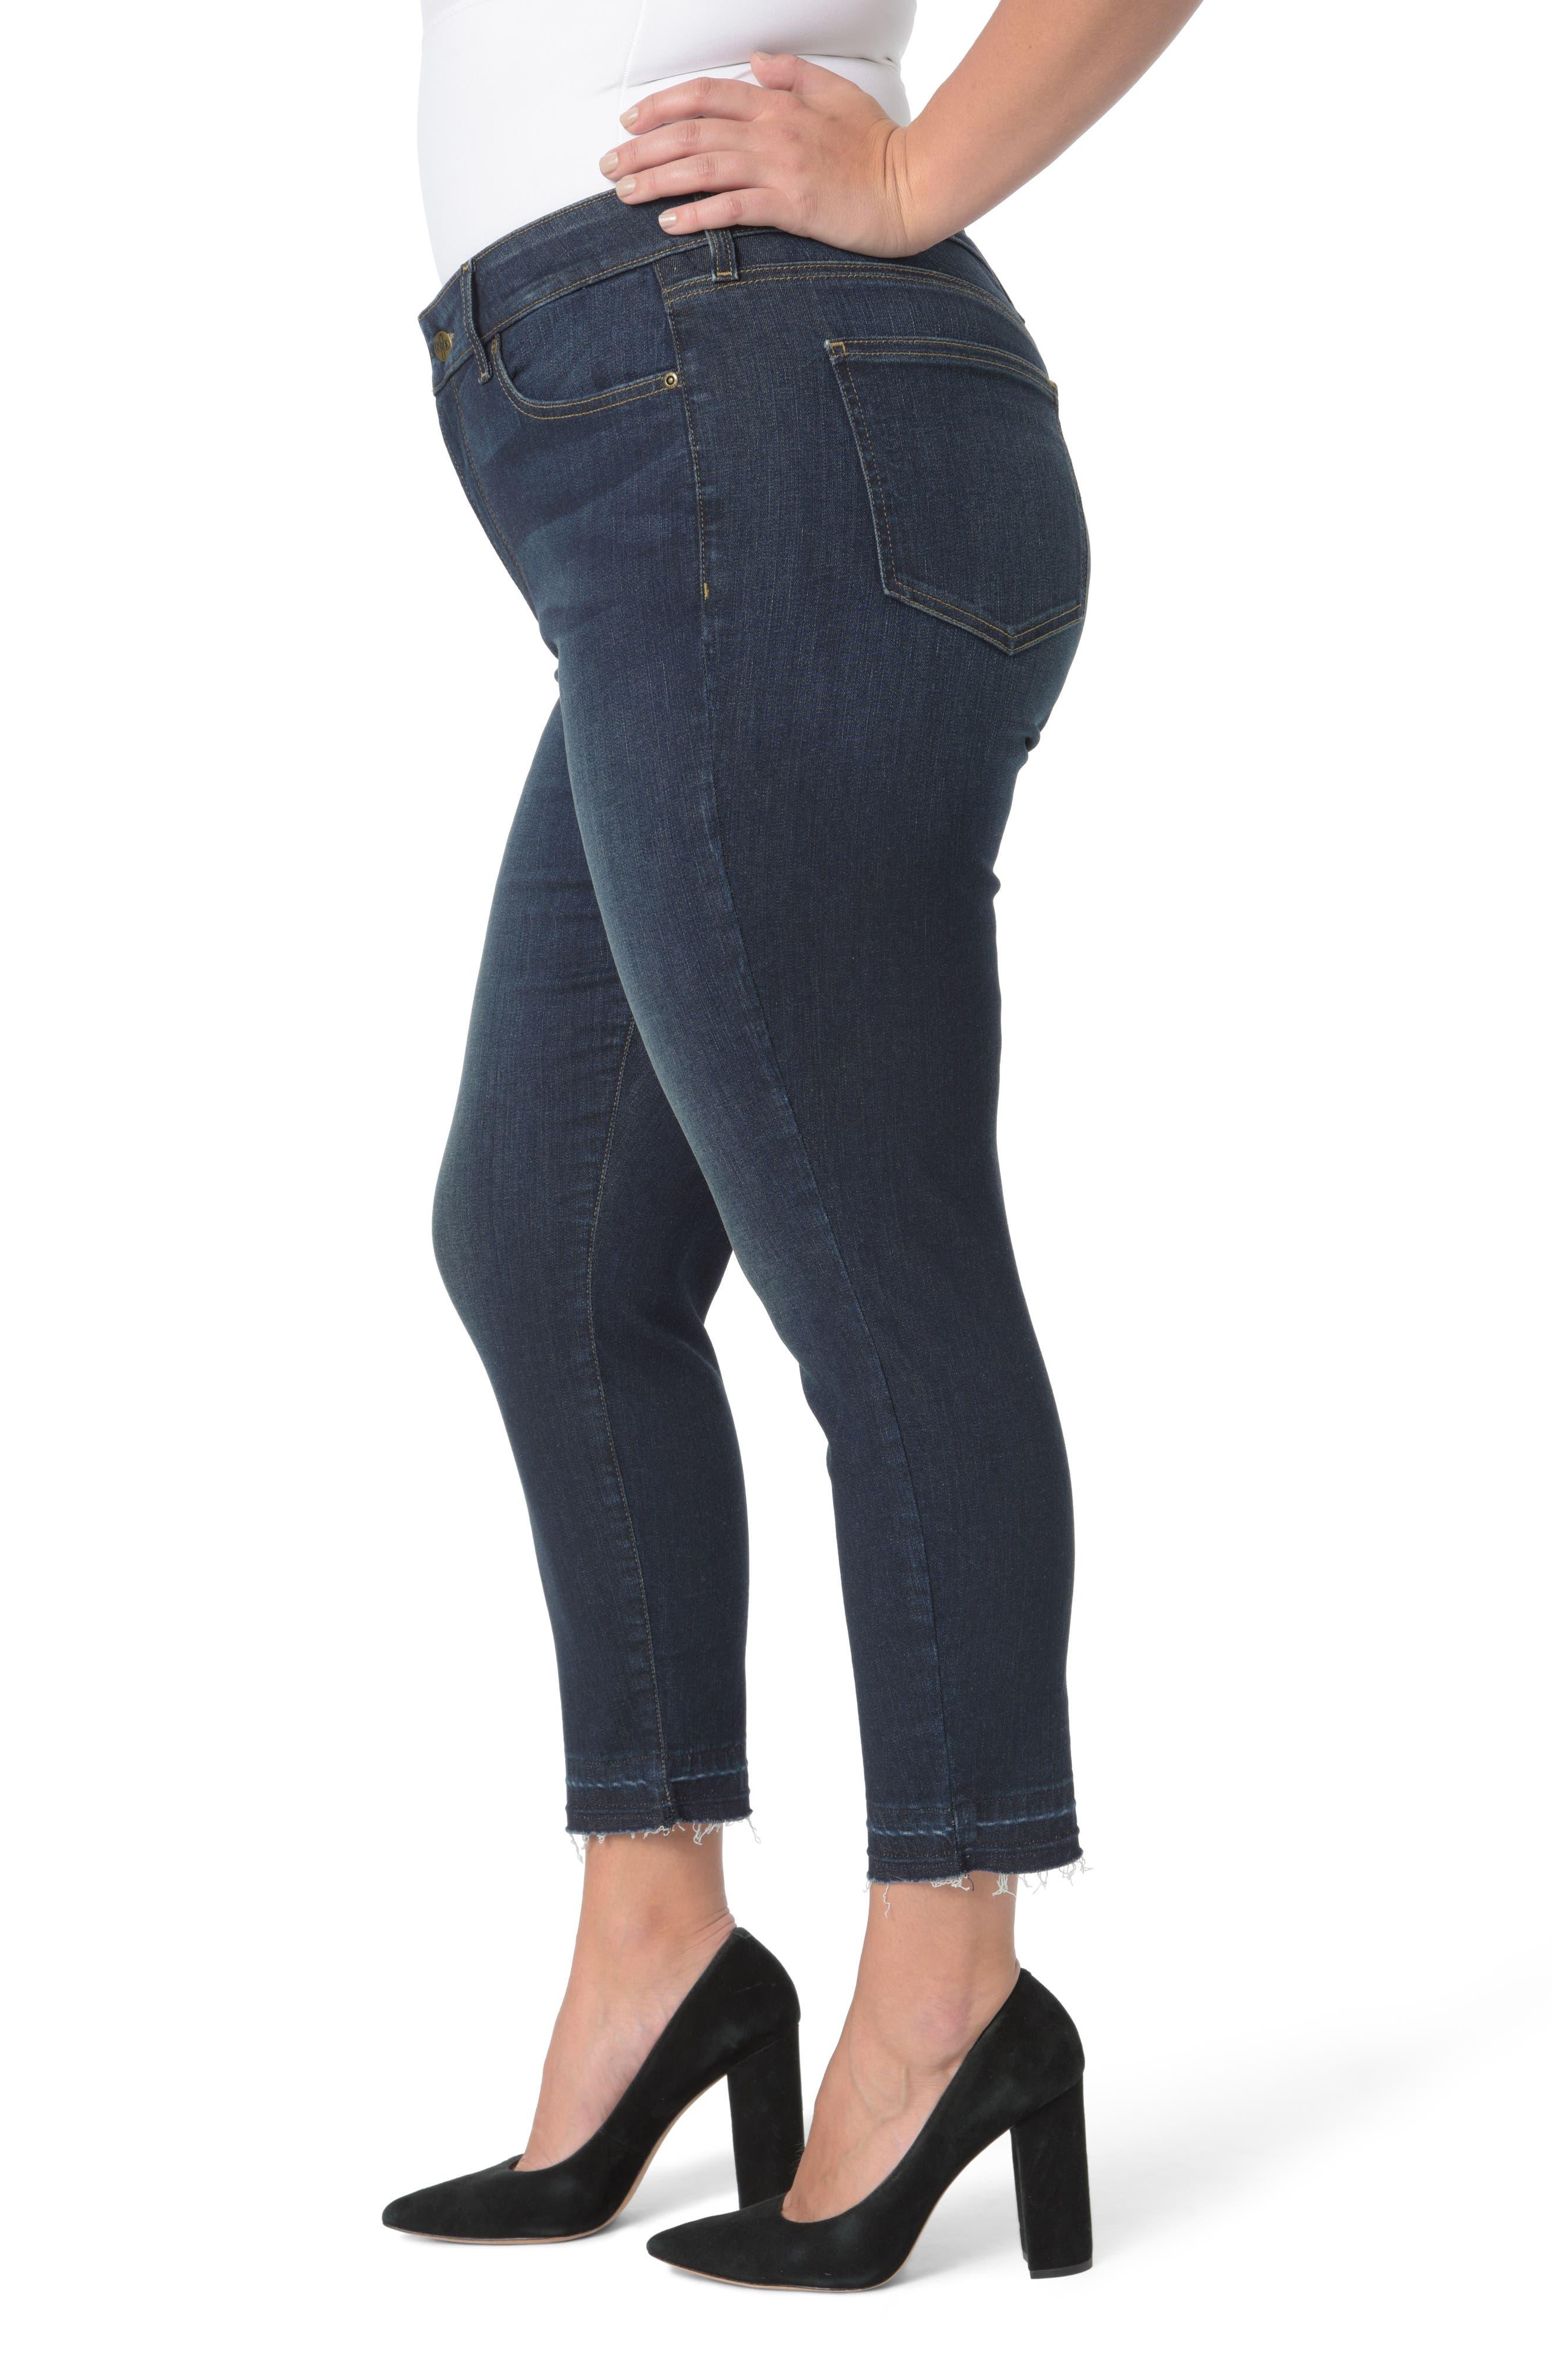 Alina Release Hem Ankle Jeans,                             Alternate thumbnail 3, color,                             421